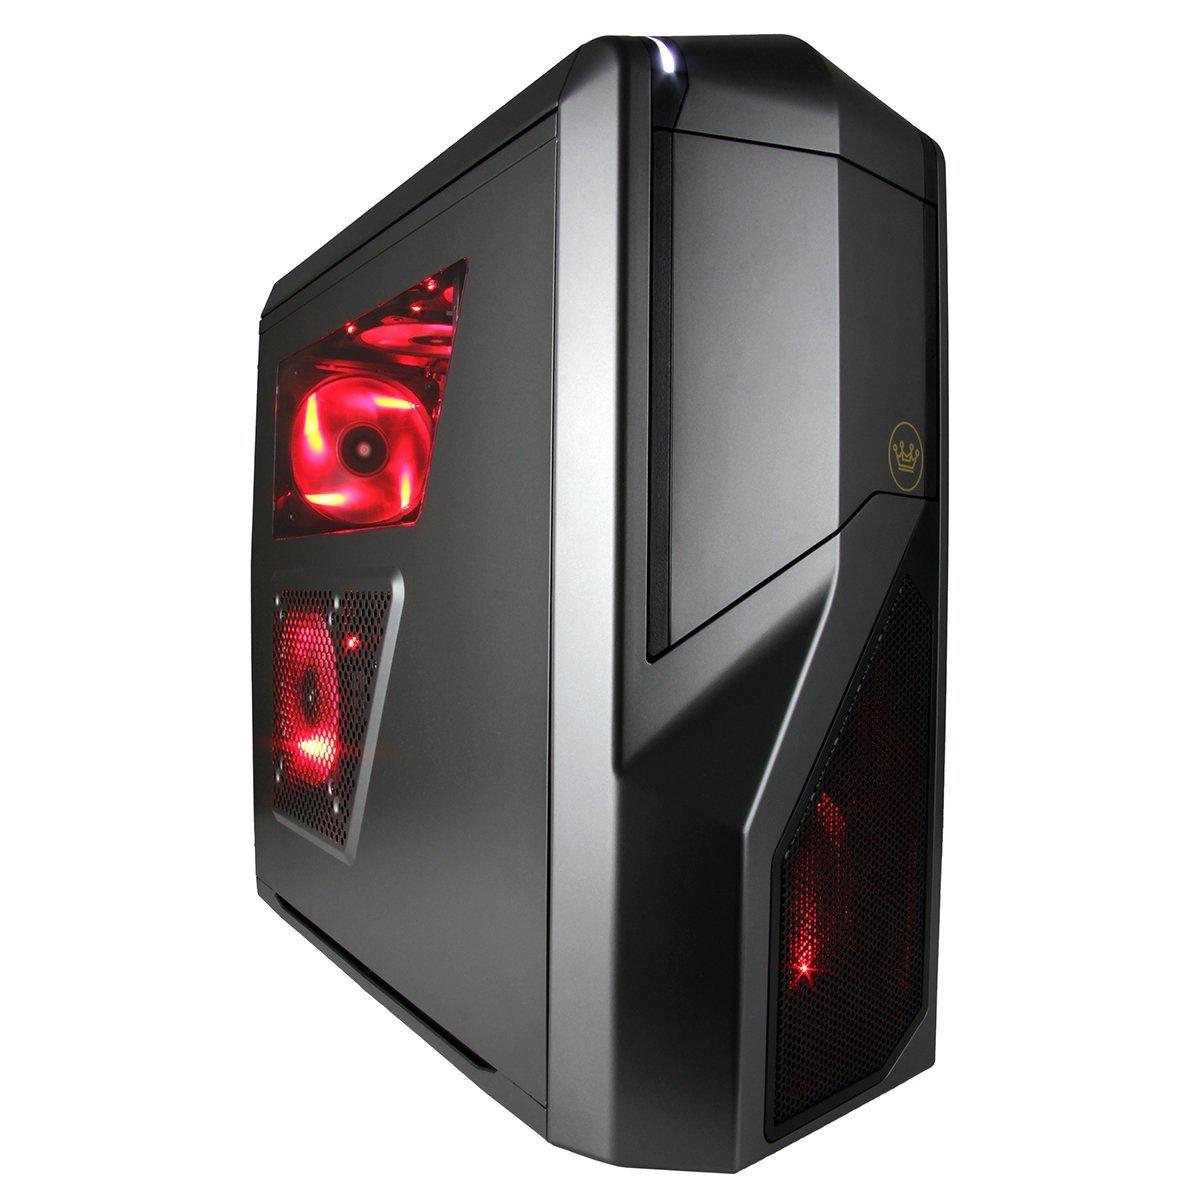 Buy CUK Annihilator VR Extreme Gaming PC (Liquid Cooled